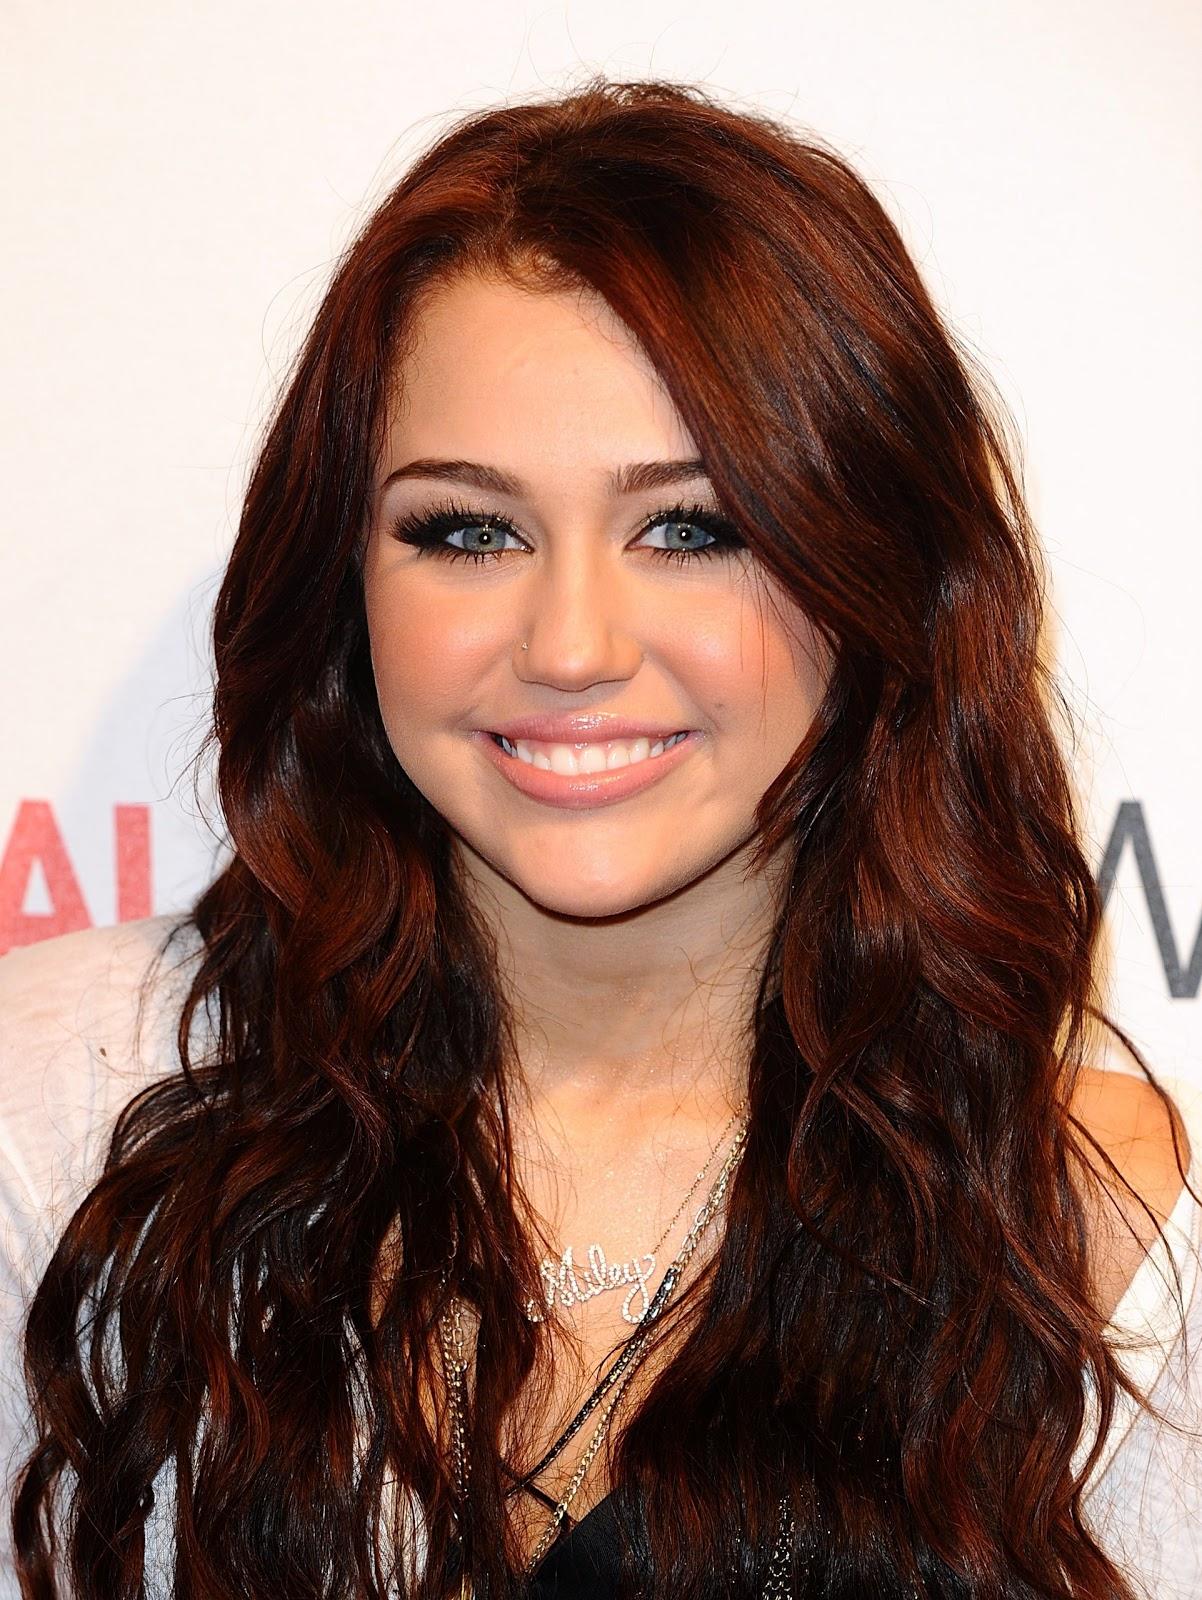 Miley Cyrus Miley Cyrus 17611732 1923 2560jpg